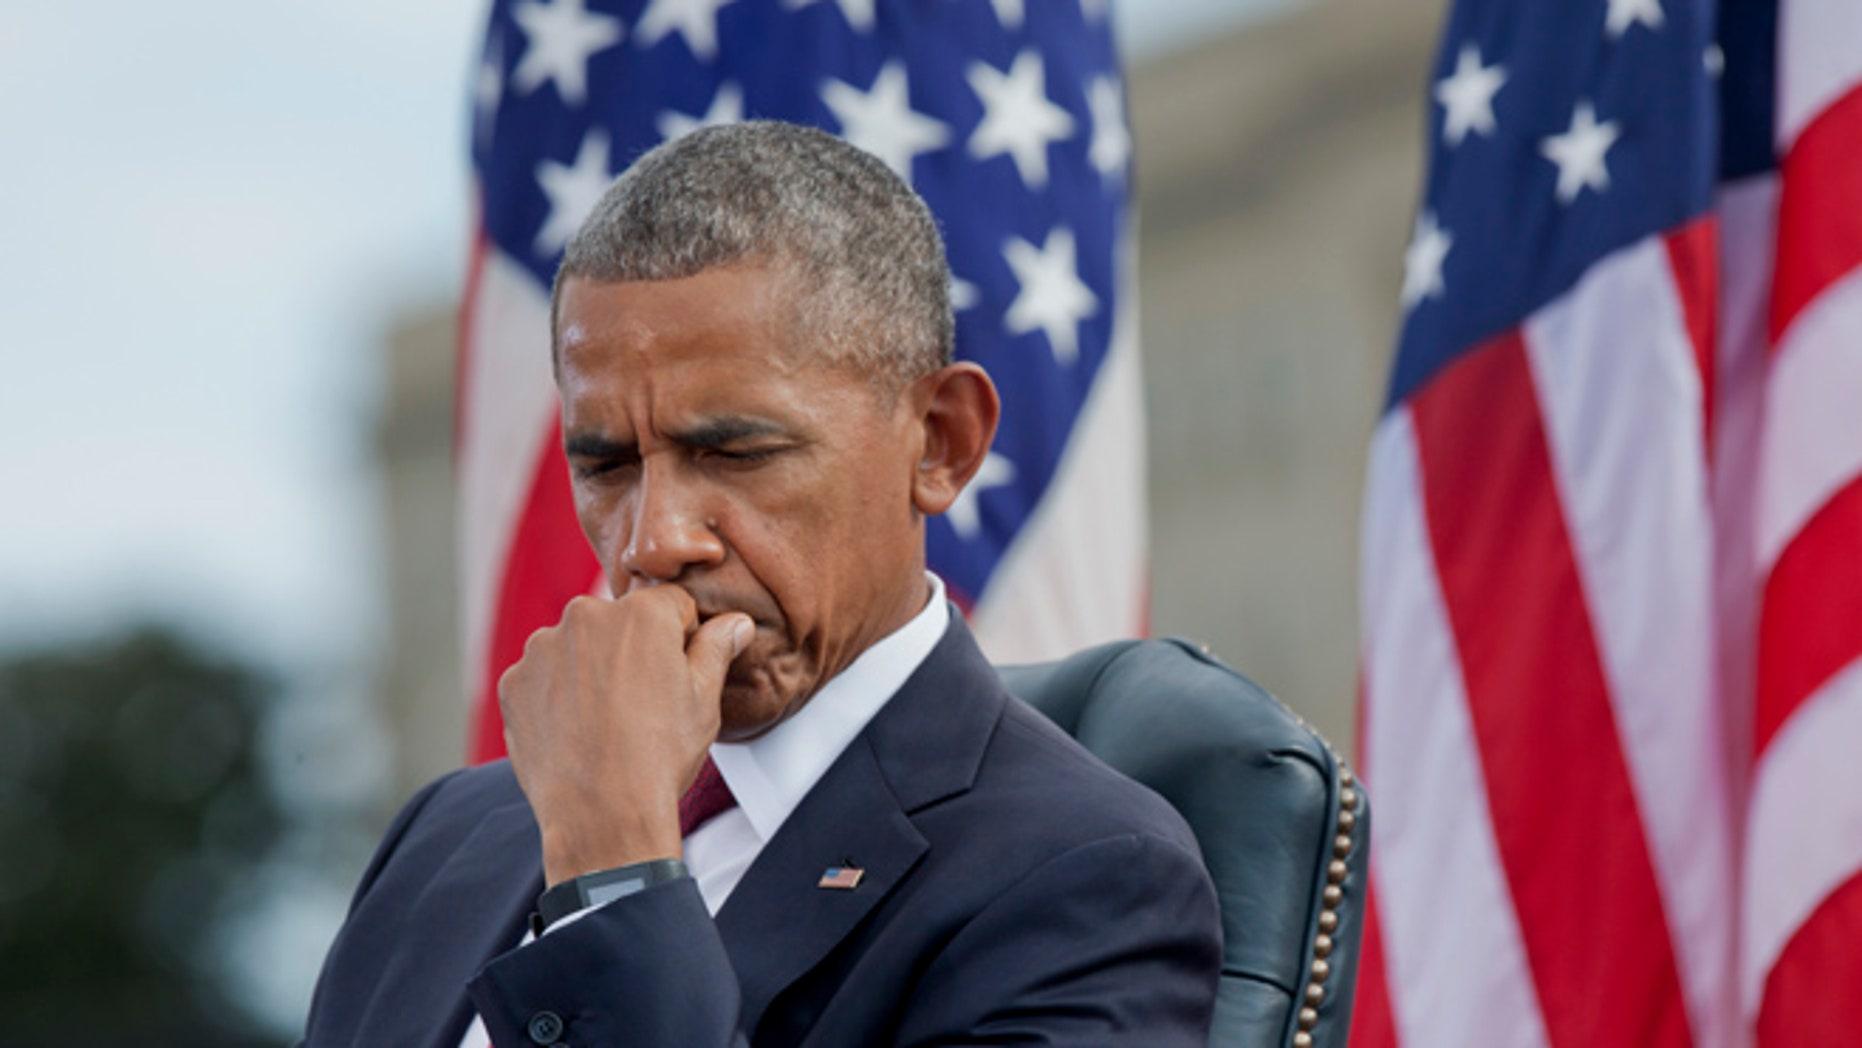 Sept. 11, 2016: President Obama at a Pentagon ceremony to commemorate the 15th anniversary of the 9/11 terrorist attacks, Arlington, Va. (AP)